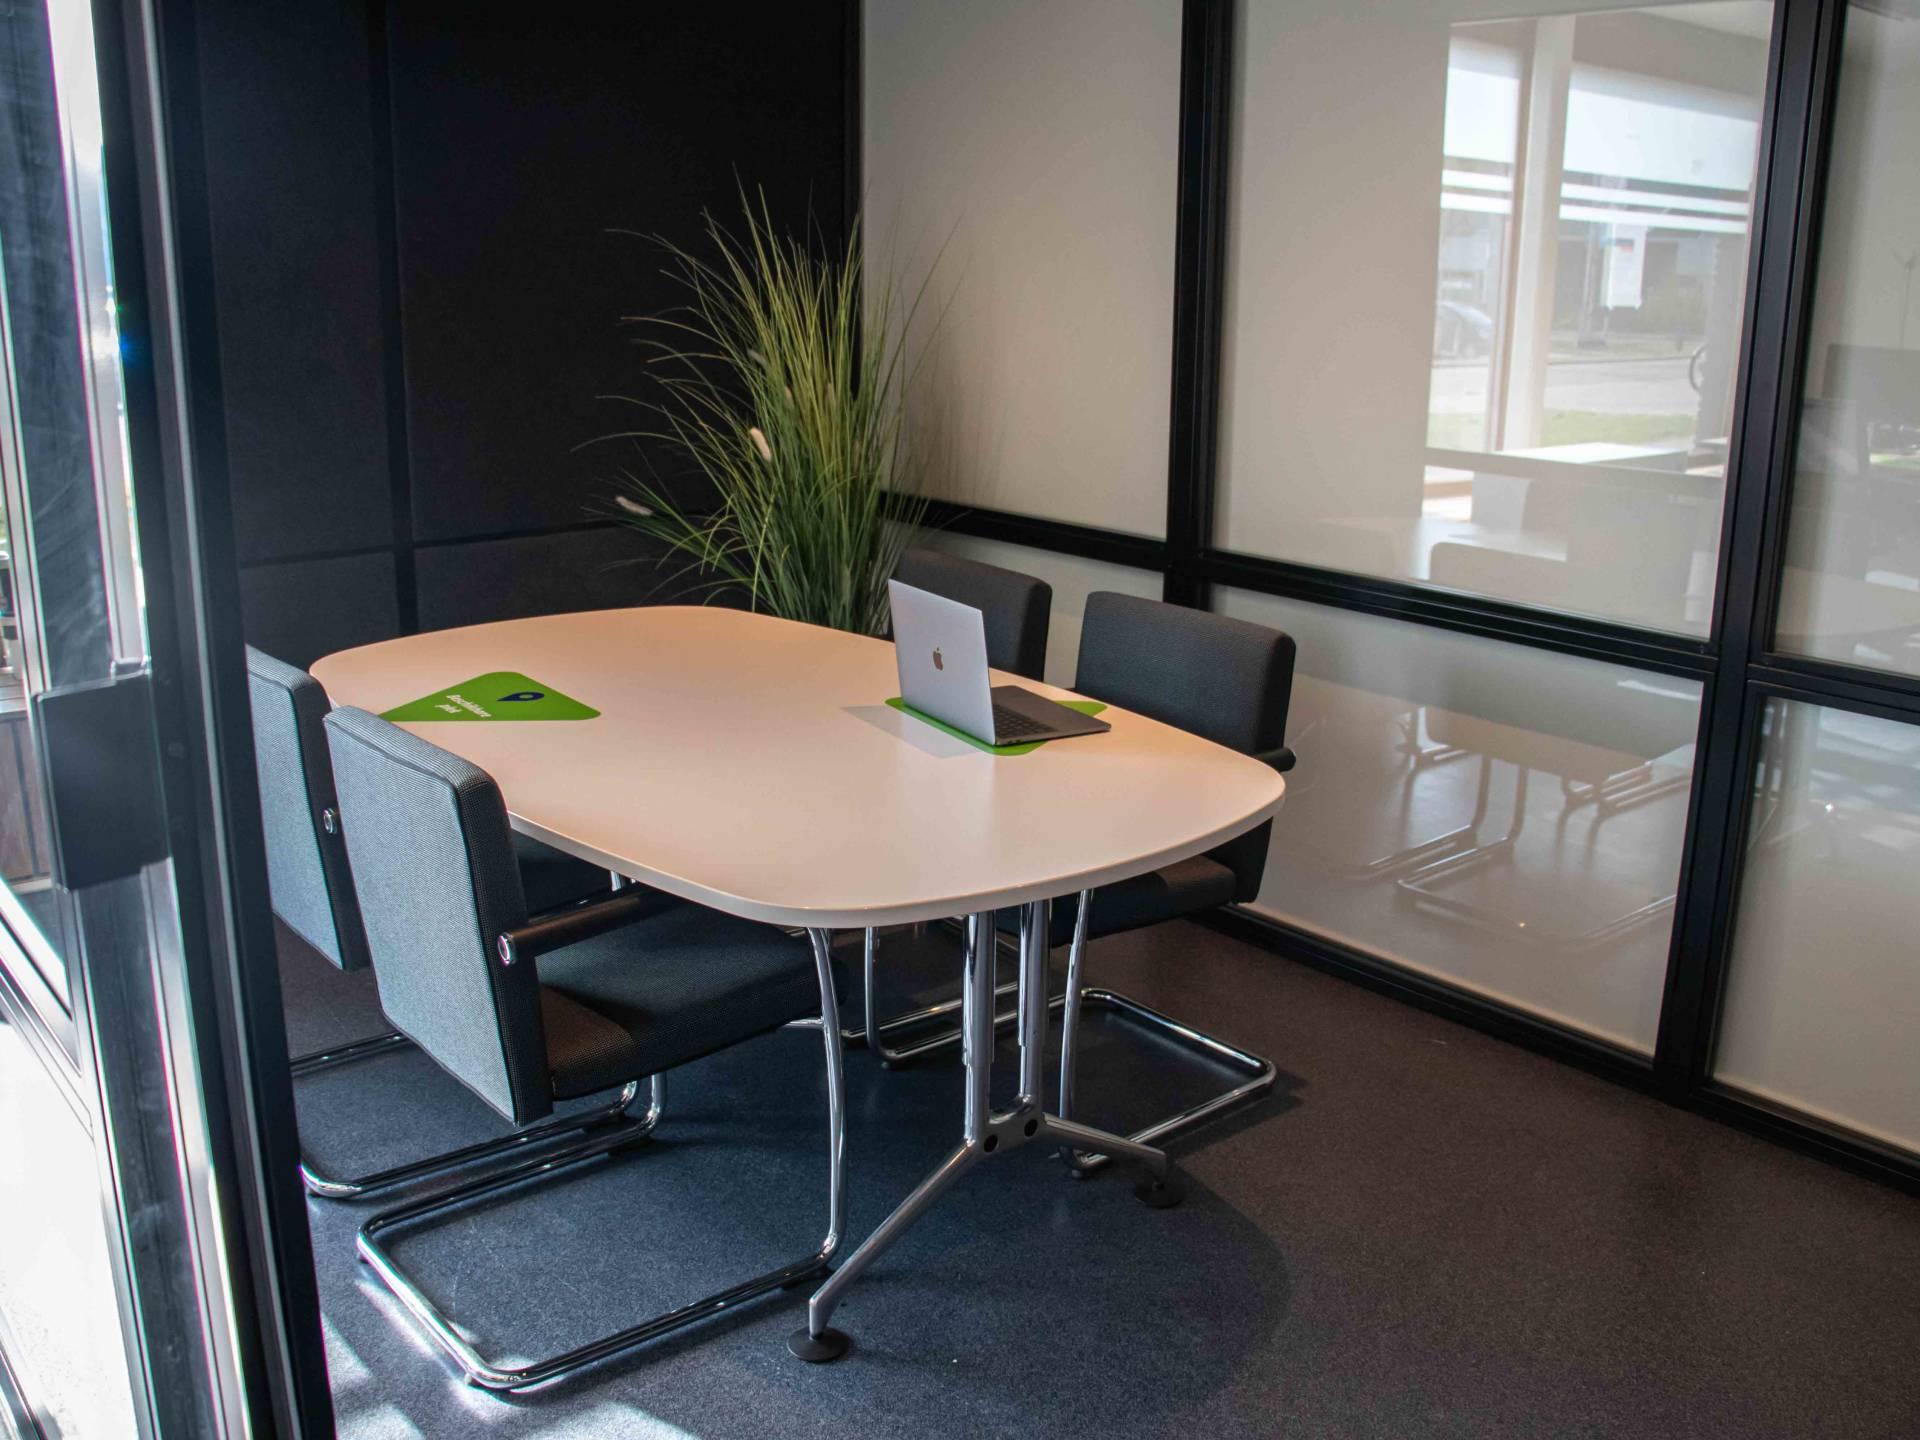 Rabobank Badhoevedorp kiest voor een multifunctionele werkplek